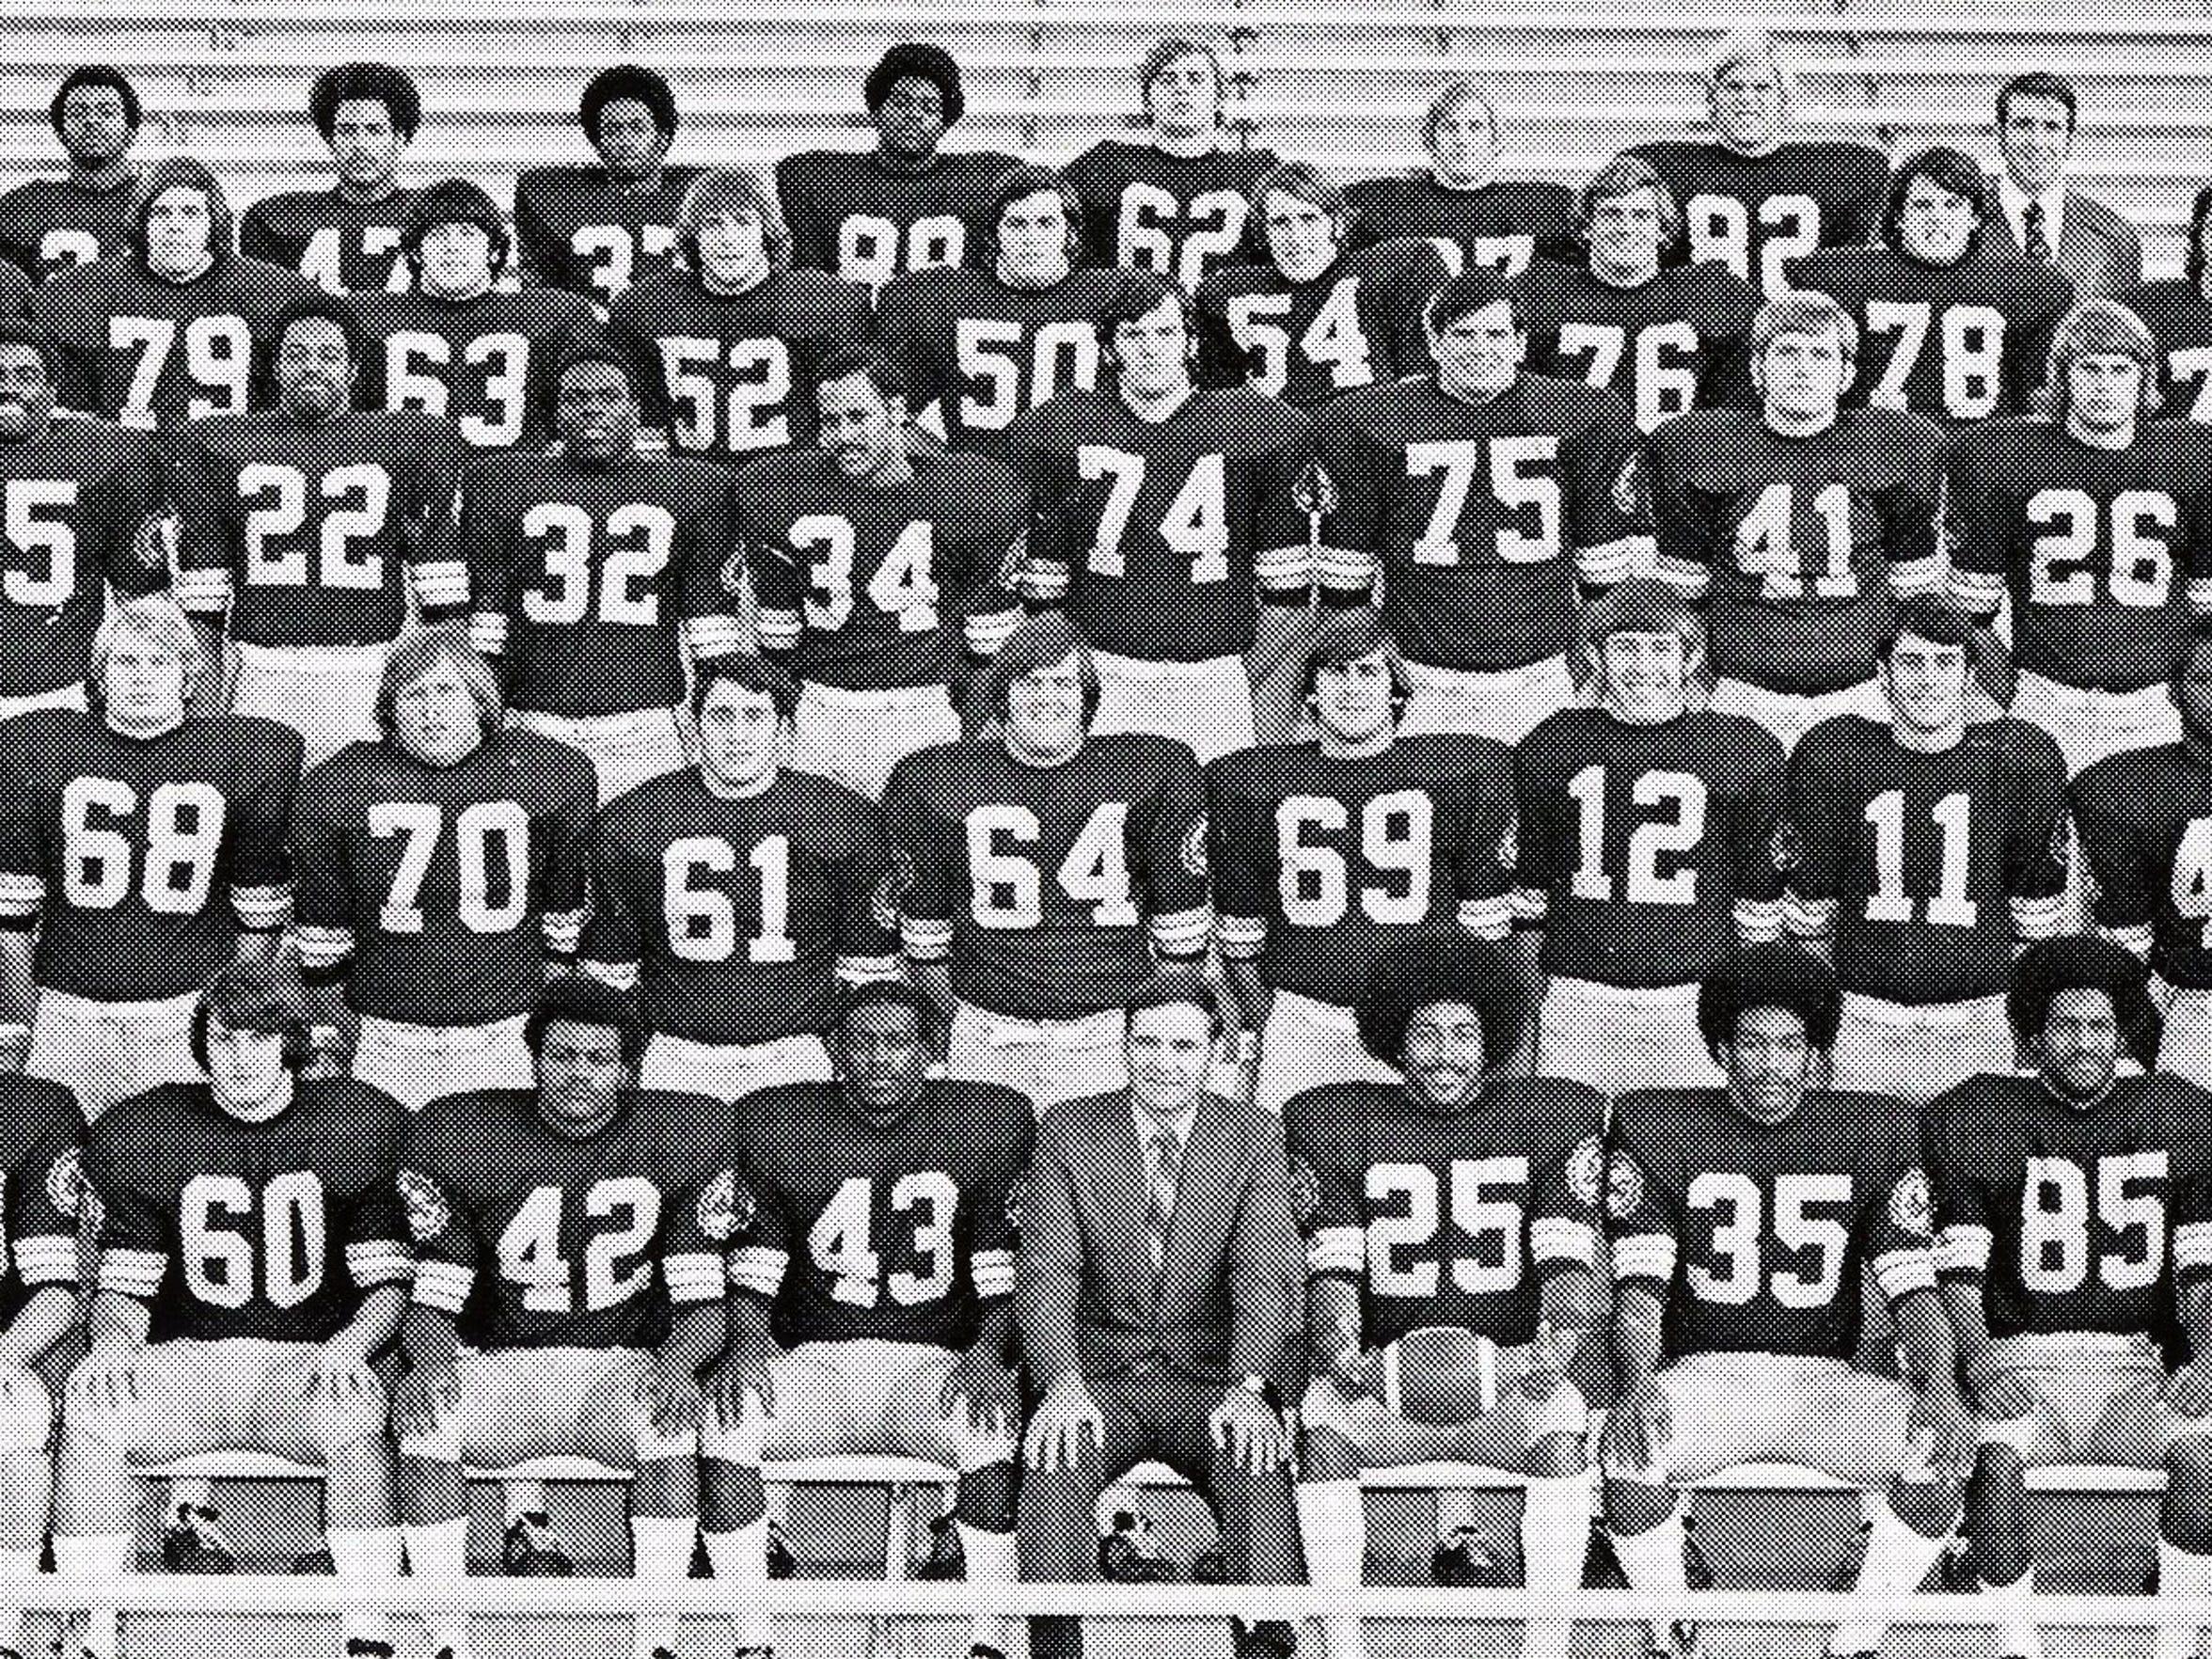 1972 ASU football team